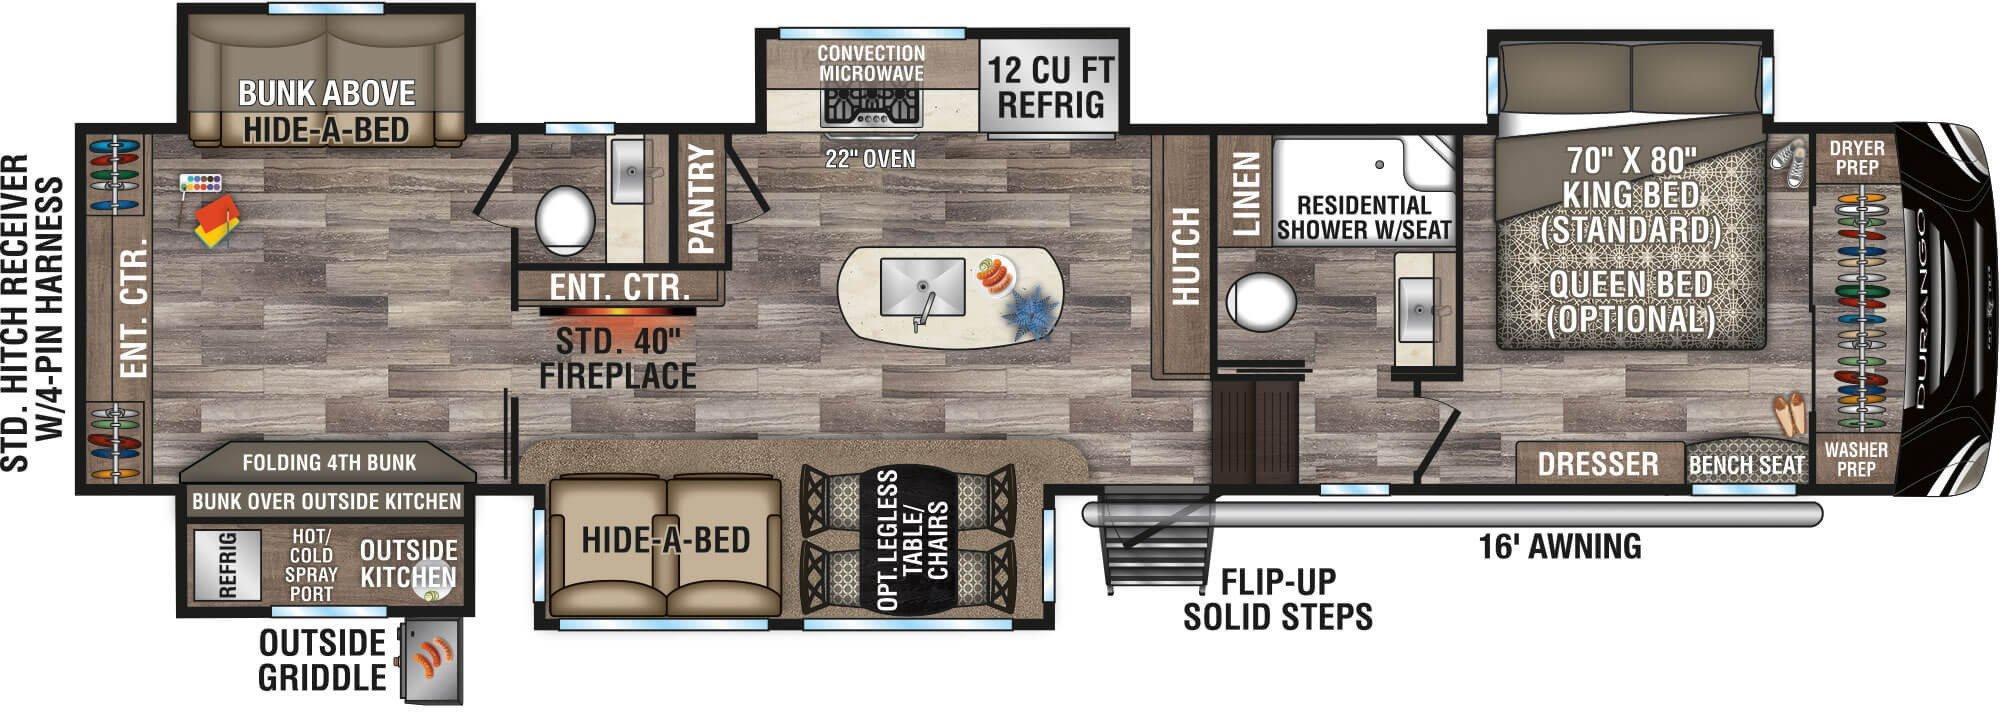 View Floor Plan for 2021 K-Z RV DURANGO 348BHF